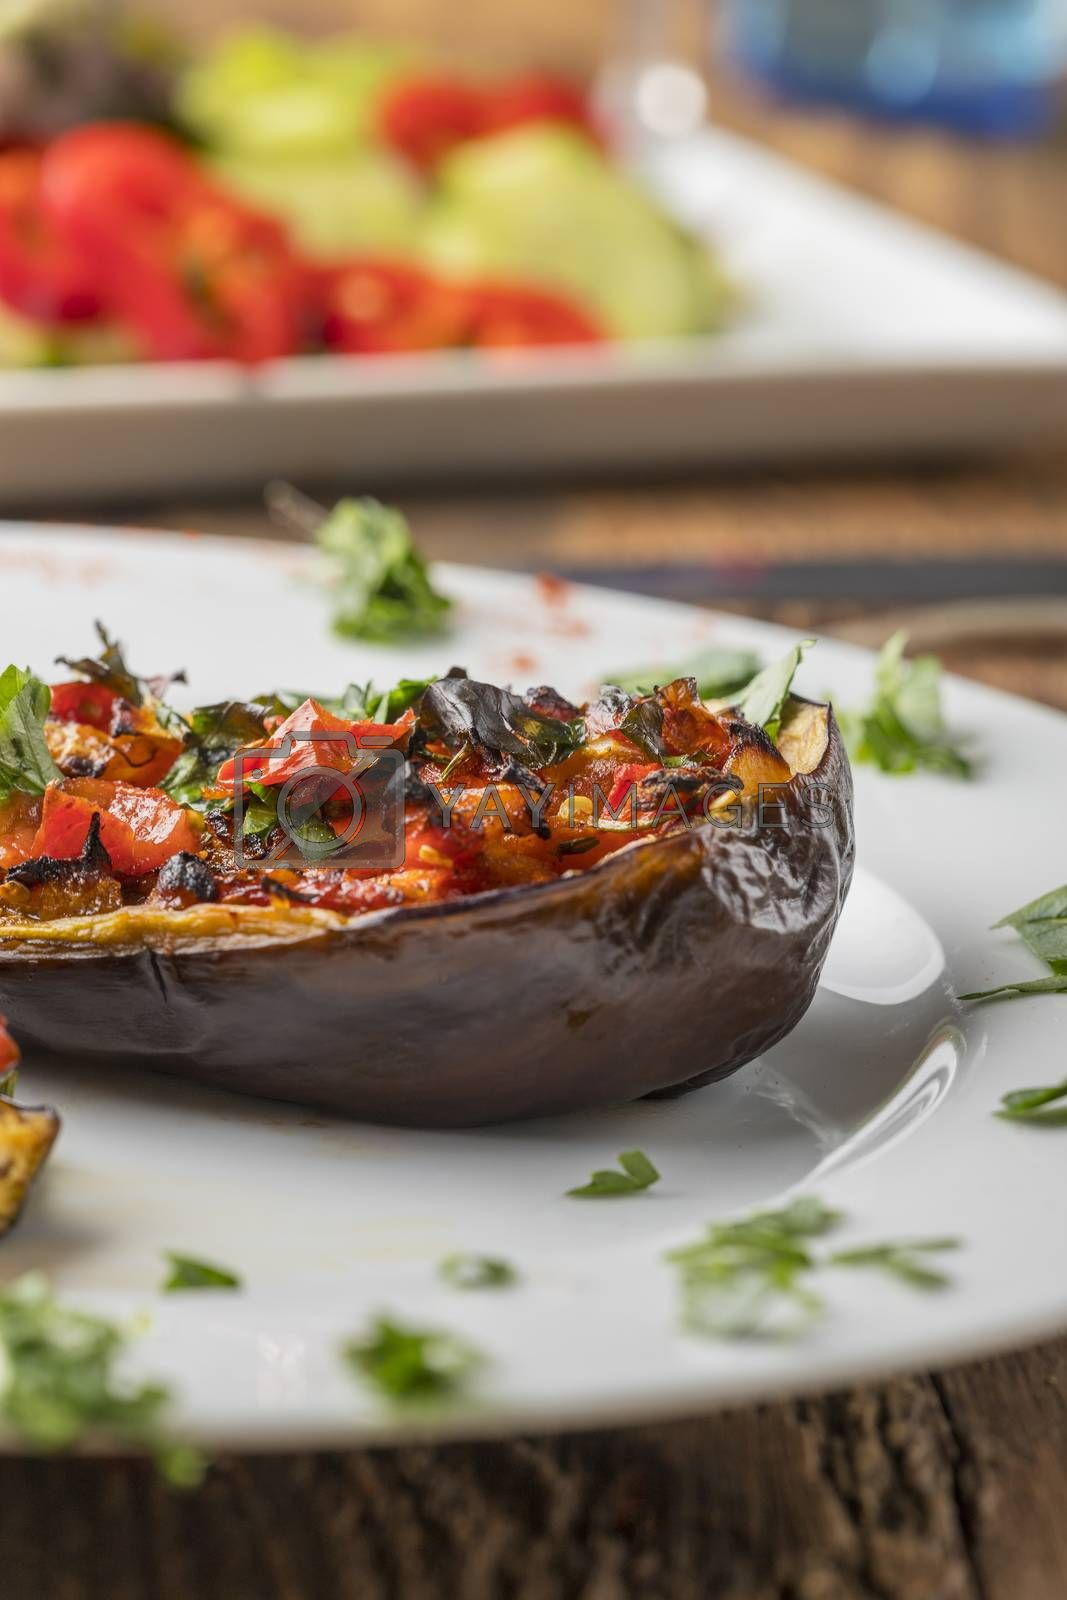 eggplant by bernjuer